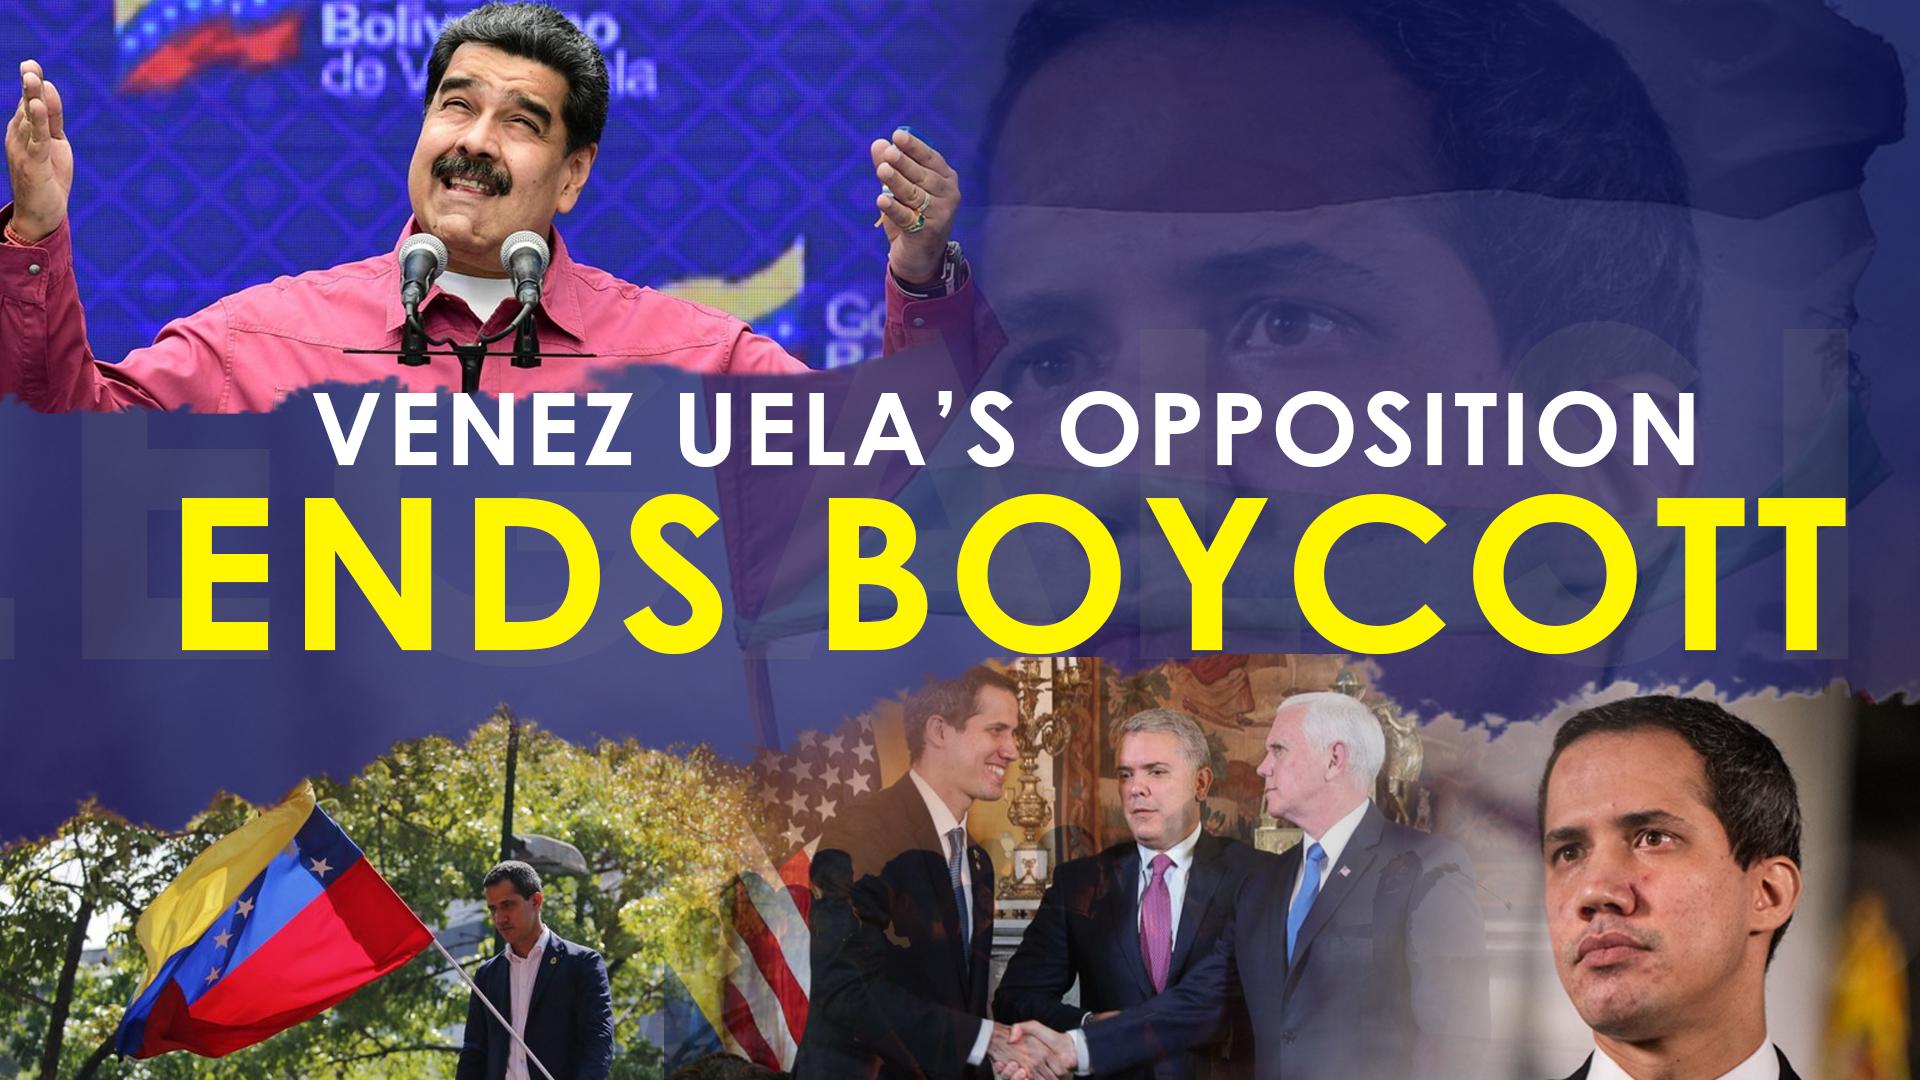 Venezuelan opposition ends political boycott